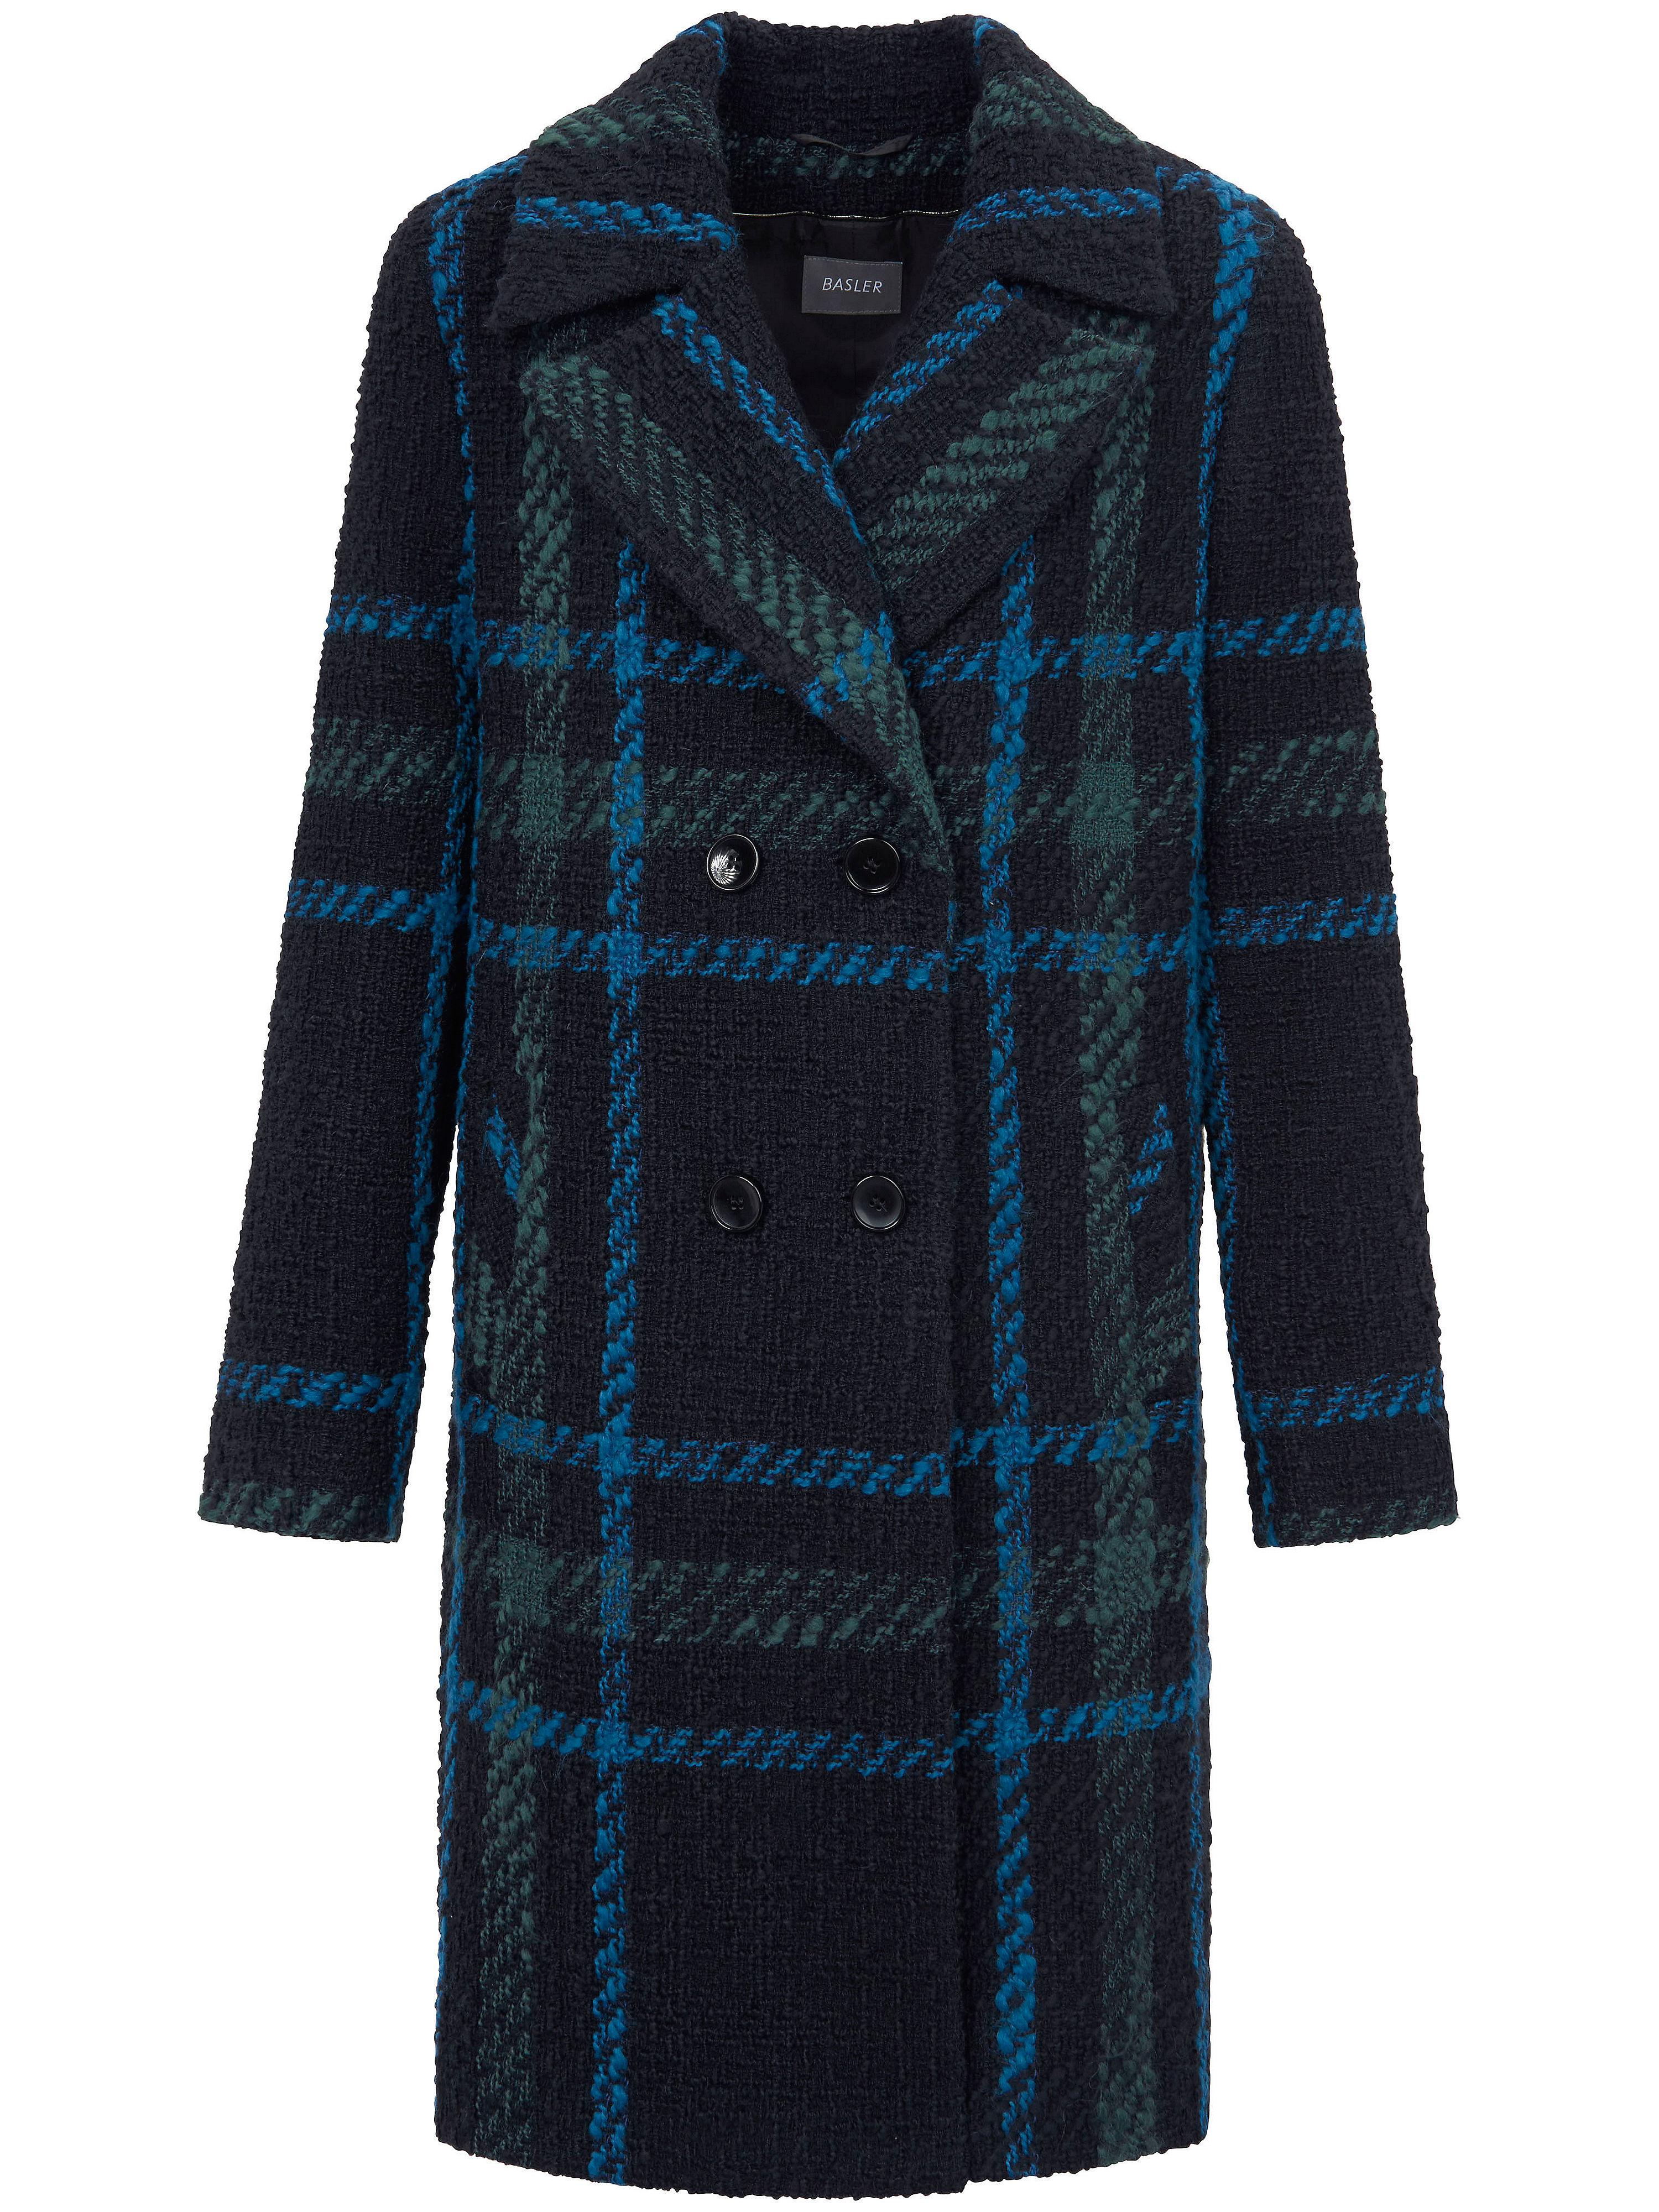 Winterjas Tijgerprint.Dames Winterjassen Online Kopen Fashionchick Nl Groot Aanbod